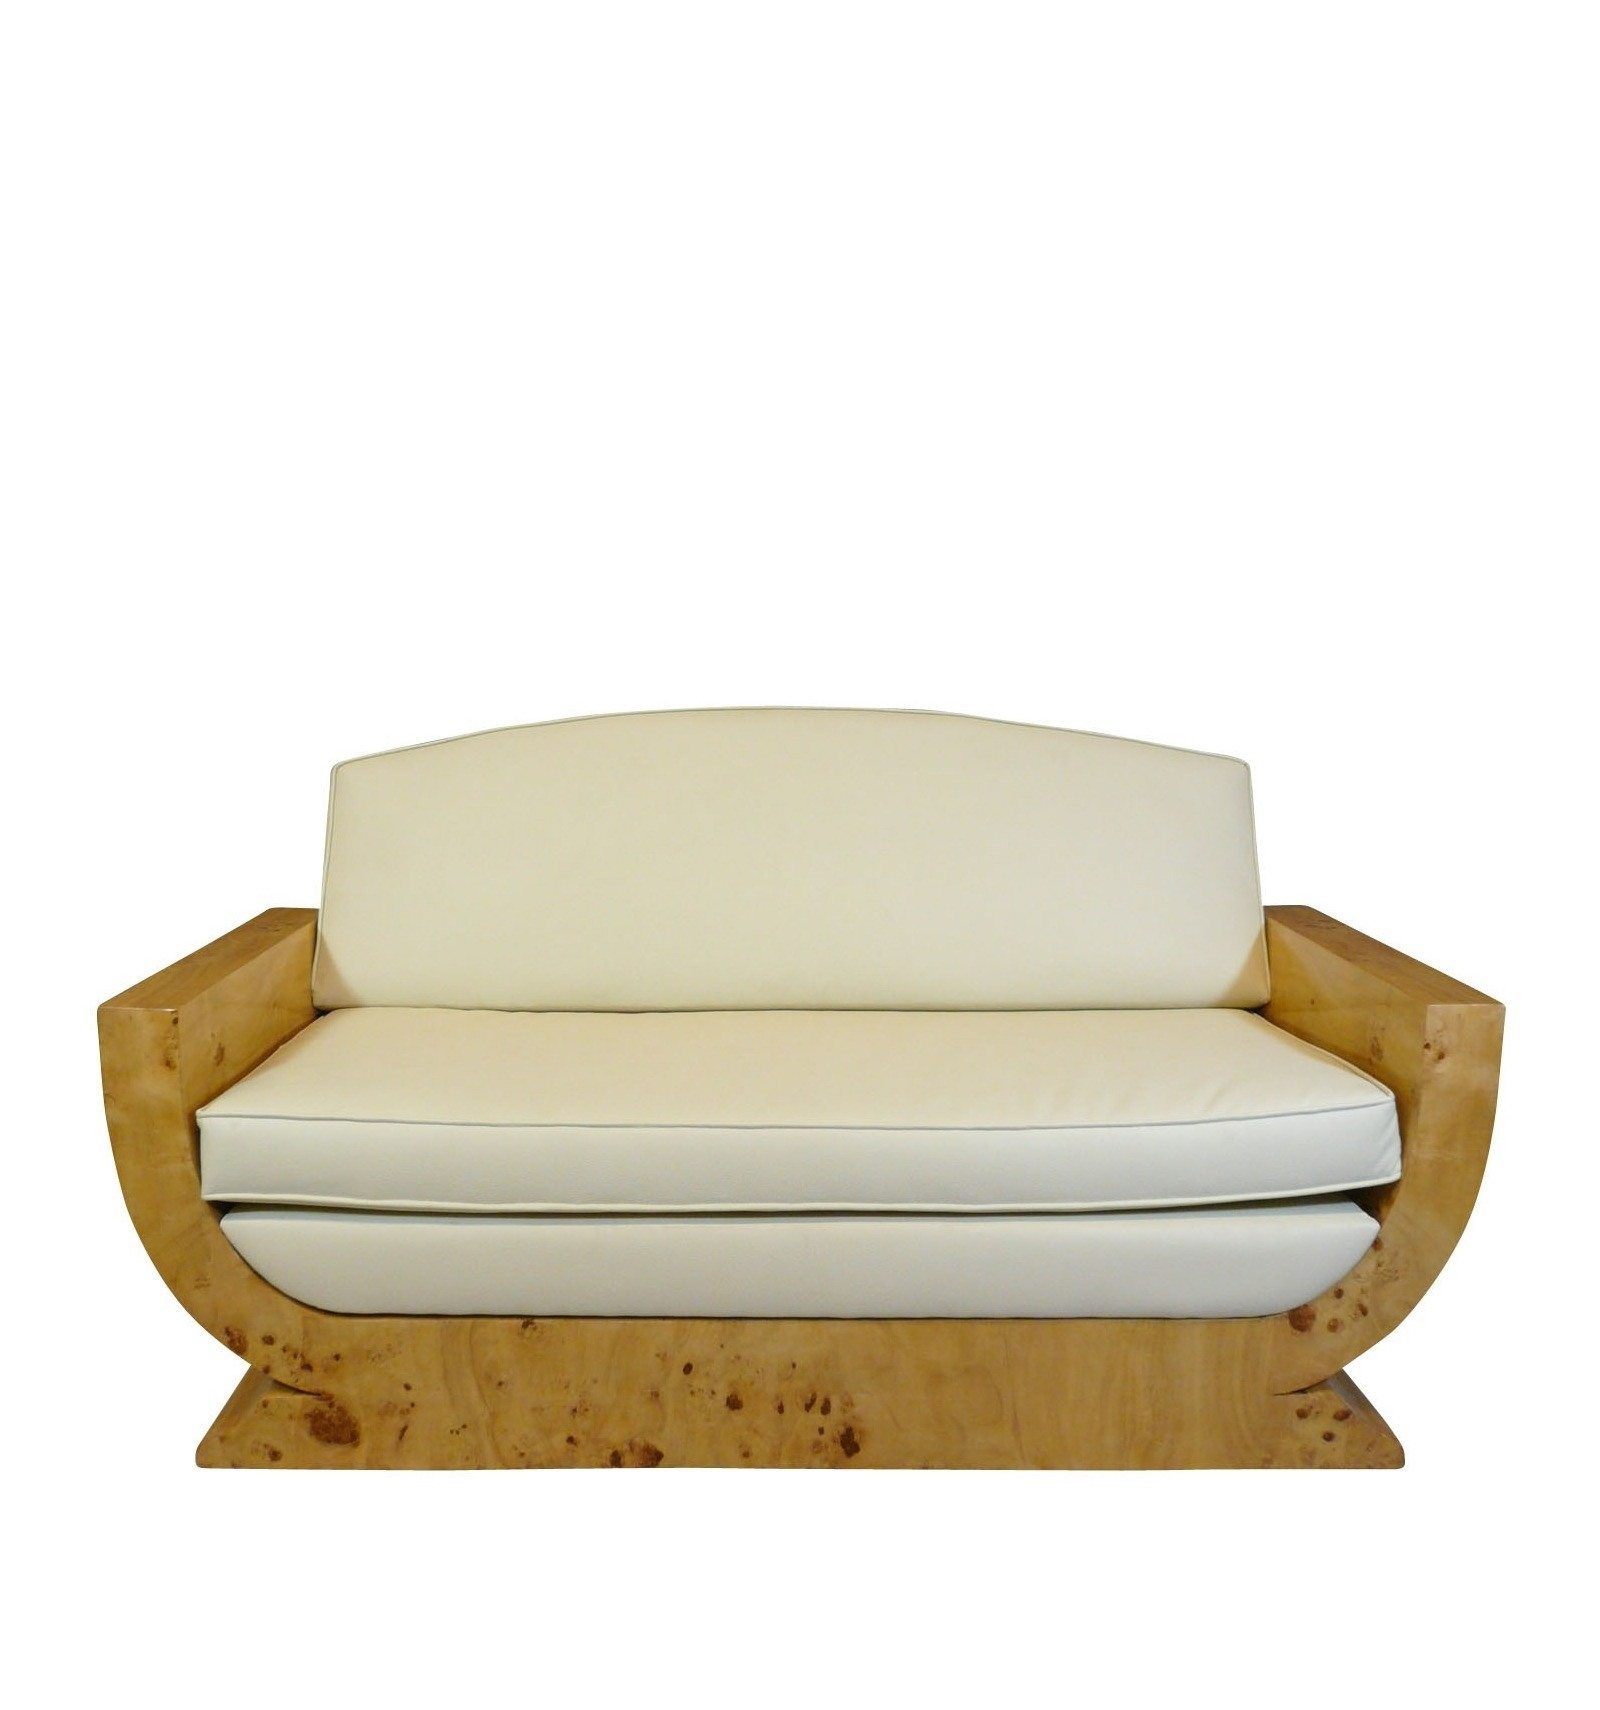 Art Deco sofa , 1920s art and style furniture